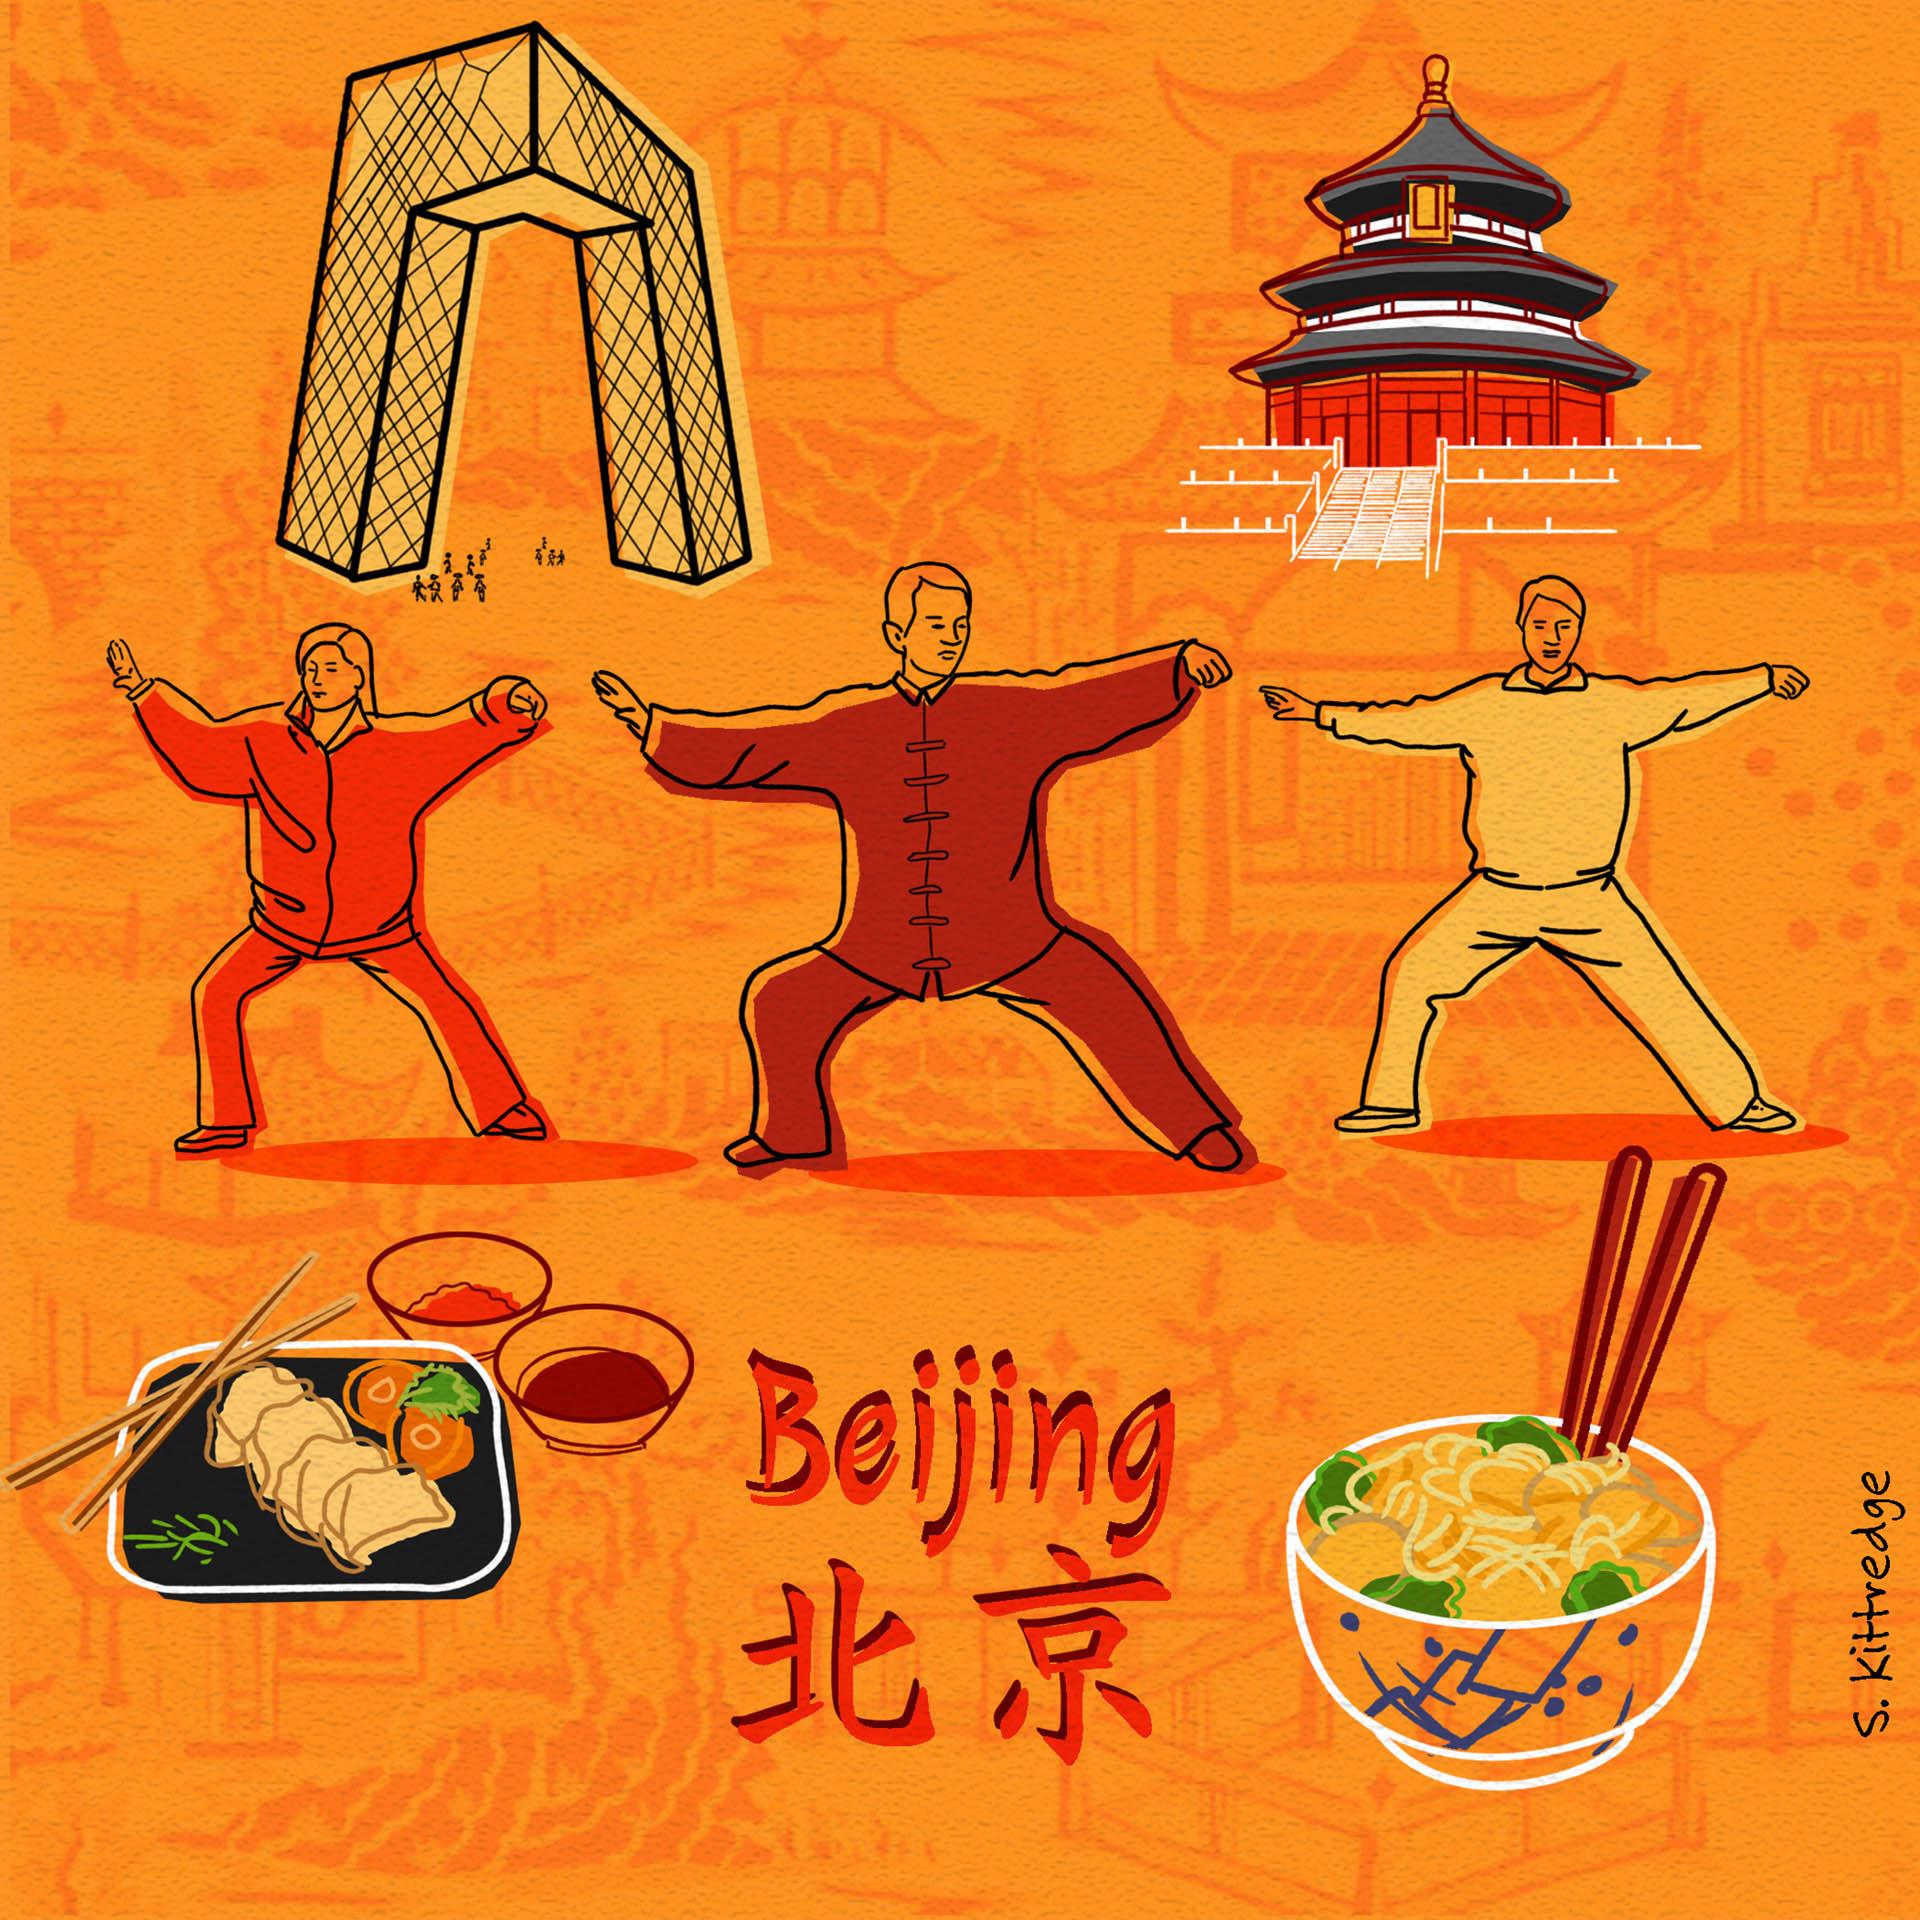 Beijing Inktober Illustration 2020 • Project: They Draw & Travel